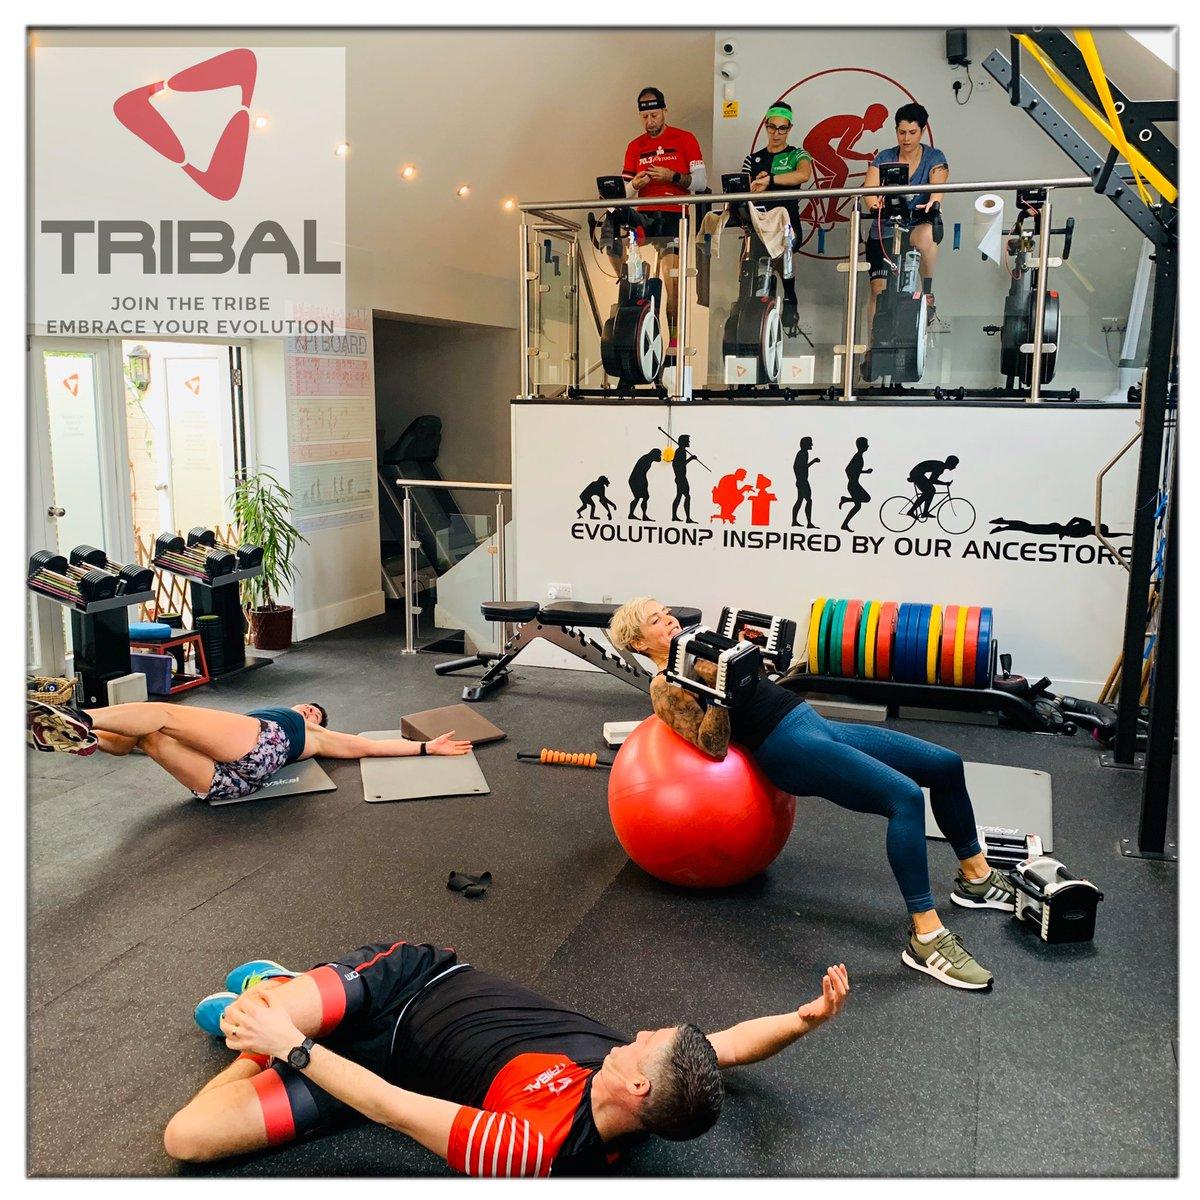 T R I B A L #TribalTransform #SaddleDrunk #LiveBarefoot #Vivobarefoot #UCAN #AncientandBrave #MihaBodyTec #EMStraining #WattBike #EndlessPool  #Pilates #ReformerPilates #SwimSquad #RunSquad #StrengthTraining #FMS #PNOE #Ironman #Gym #SwimBikeRun #Triathlon #Chertseypic.twitter.com/drzsz9HiHe